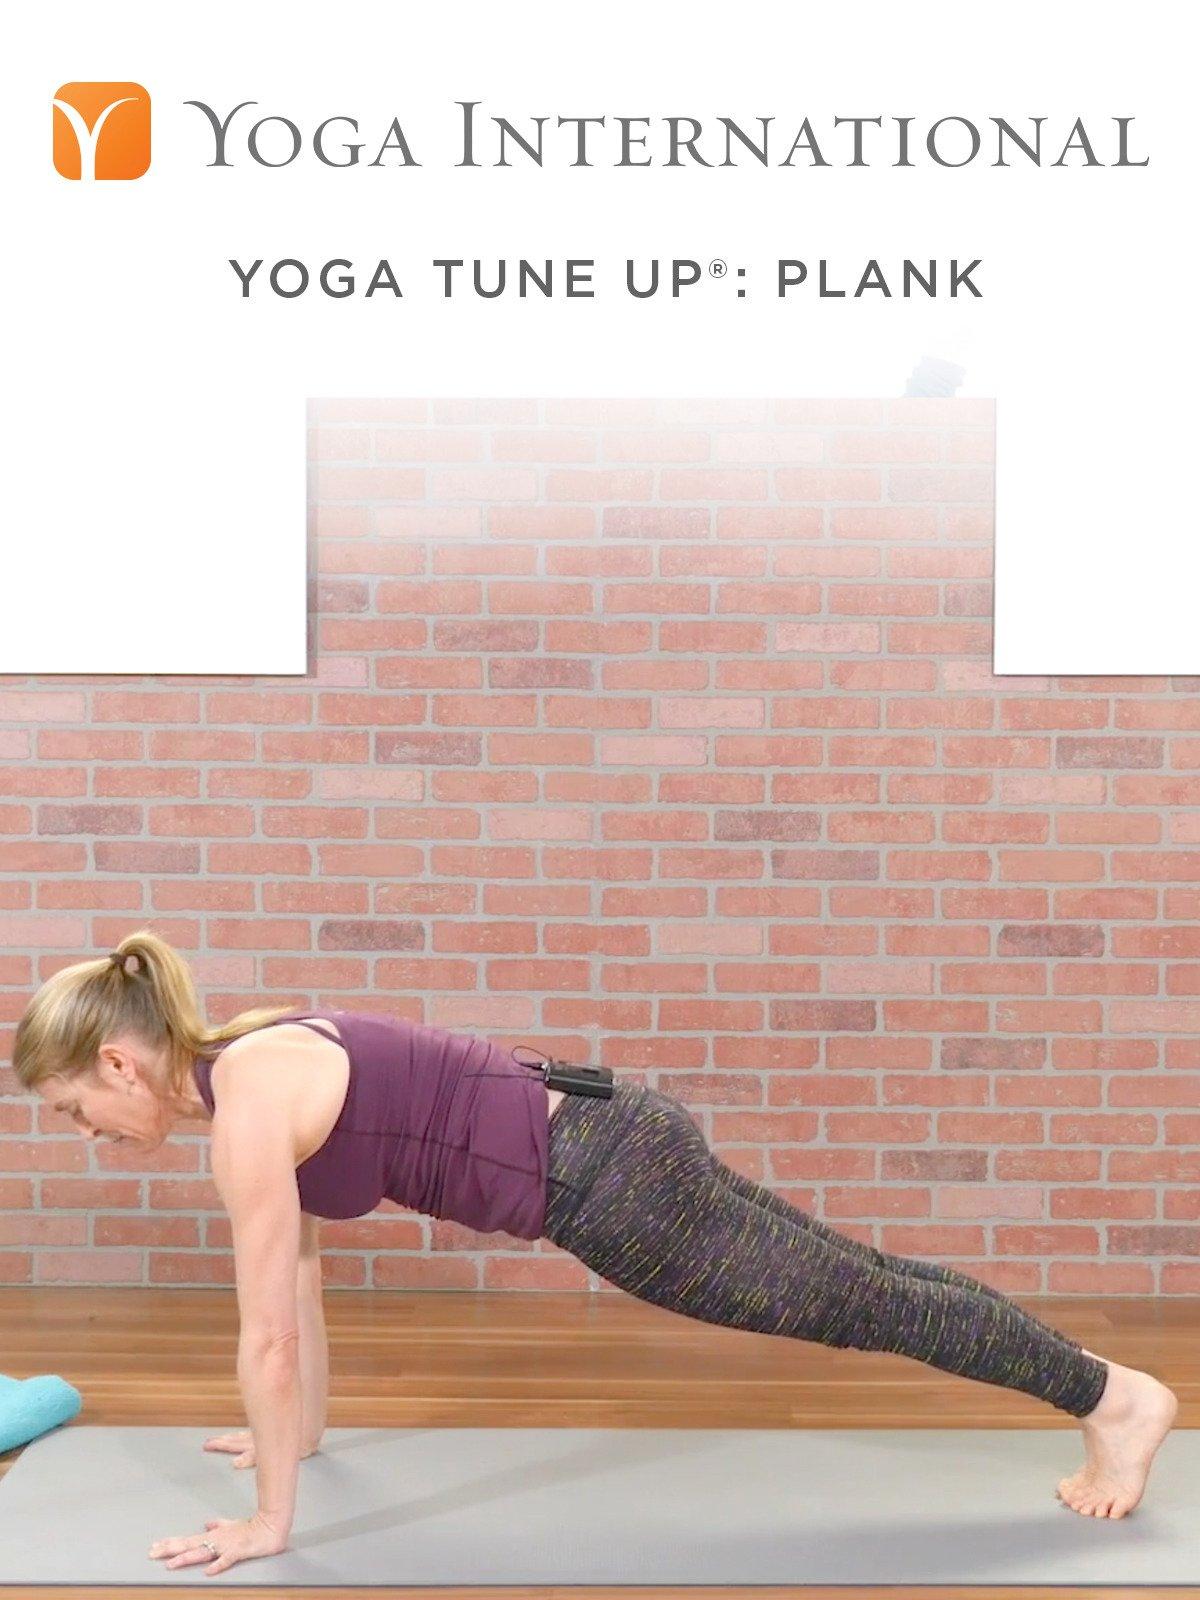 Yoga Tune Up®: Plank